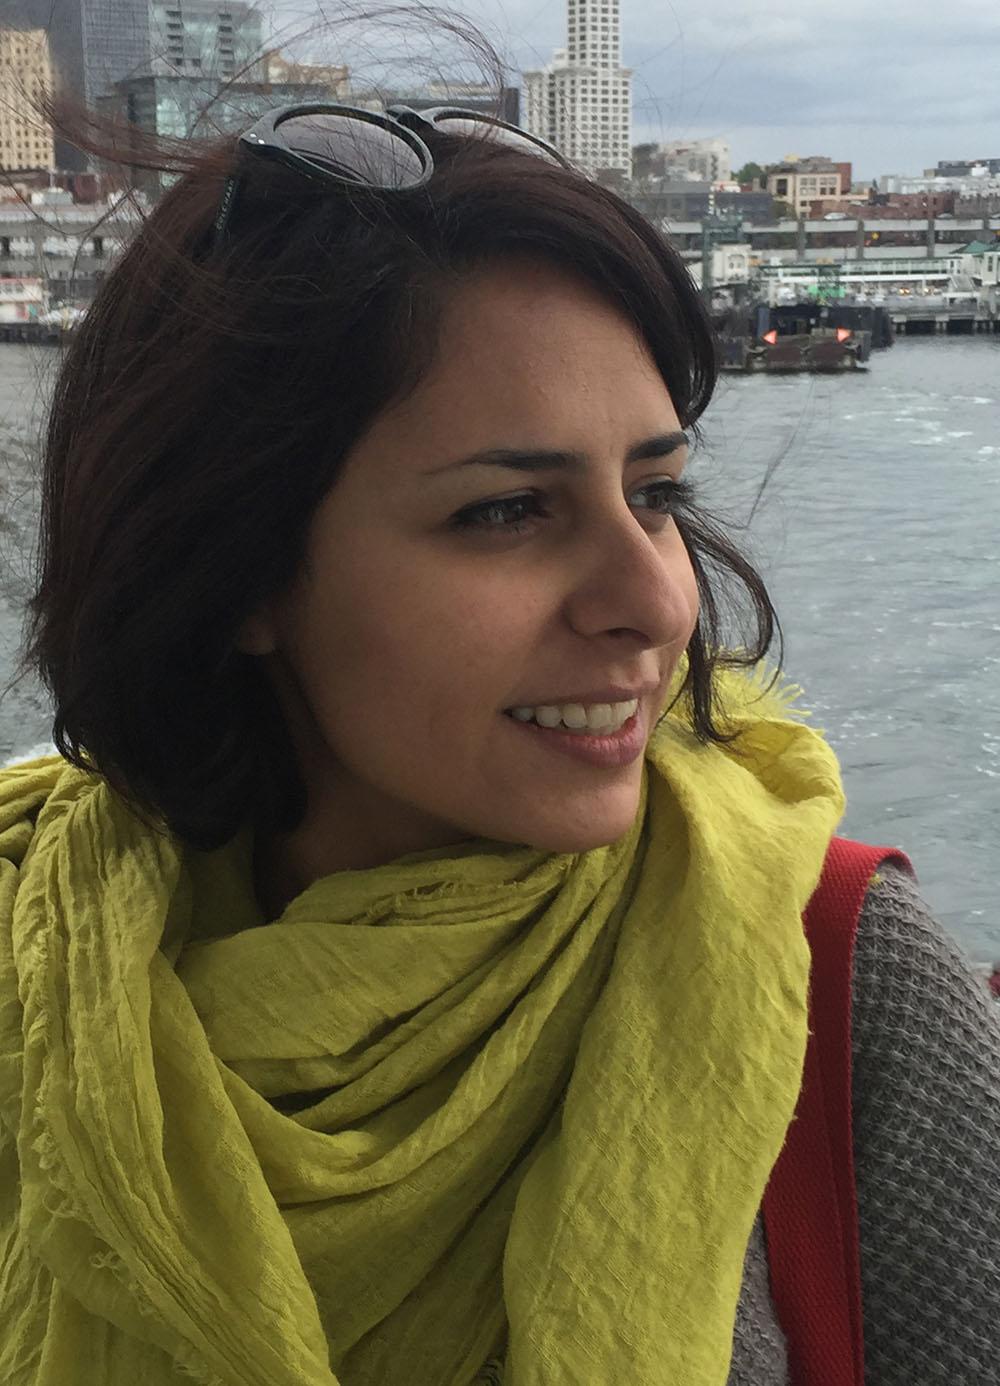 Naghmeh Farzaneh